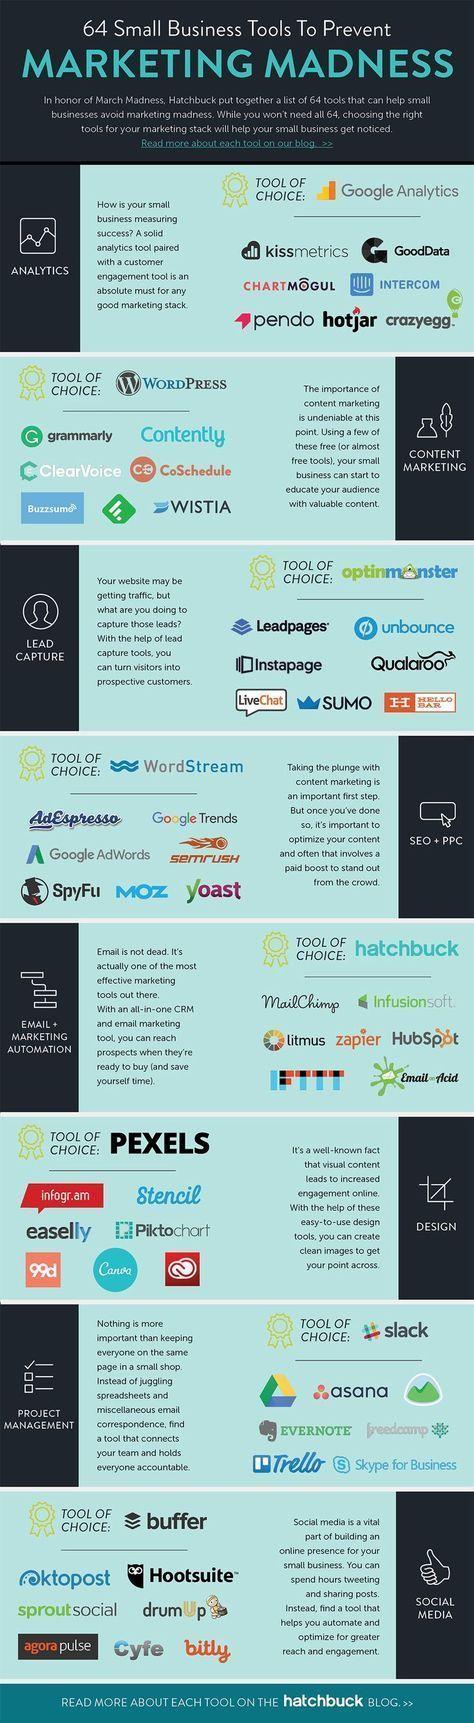 social entrepreneurship business plan template - best 25 small business plan ideas on pinterest template